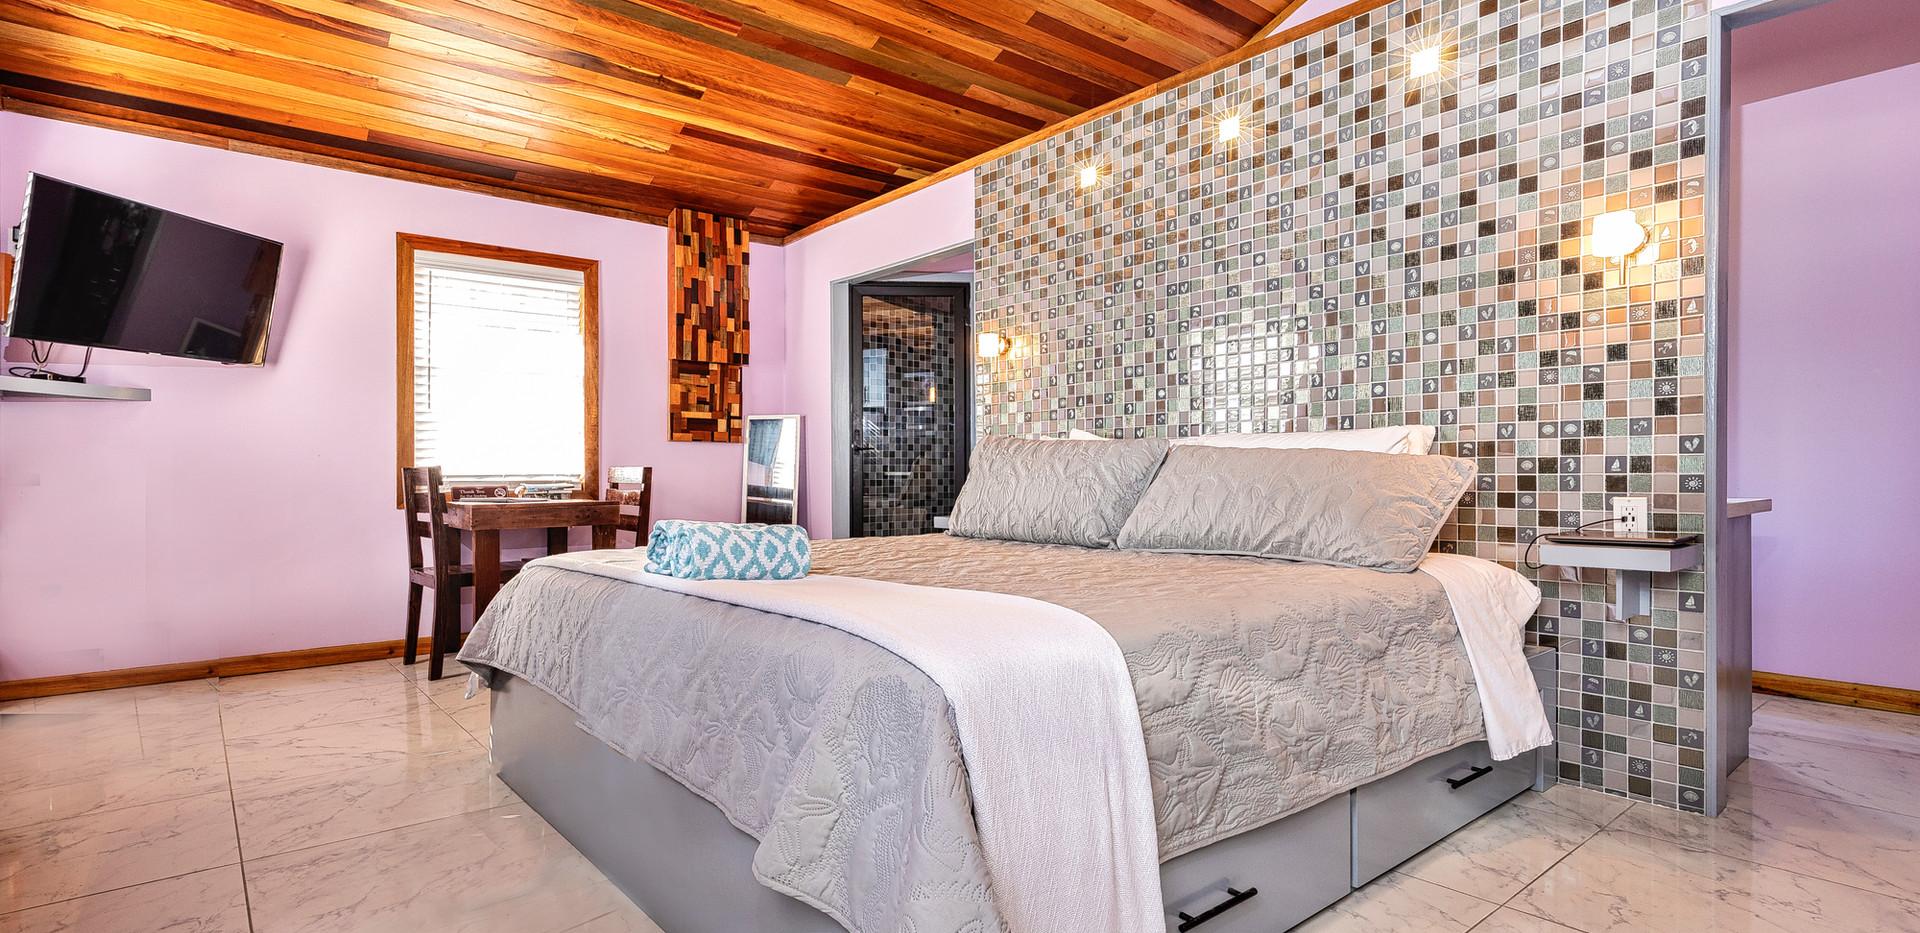 Casita - comfy, king bed